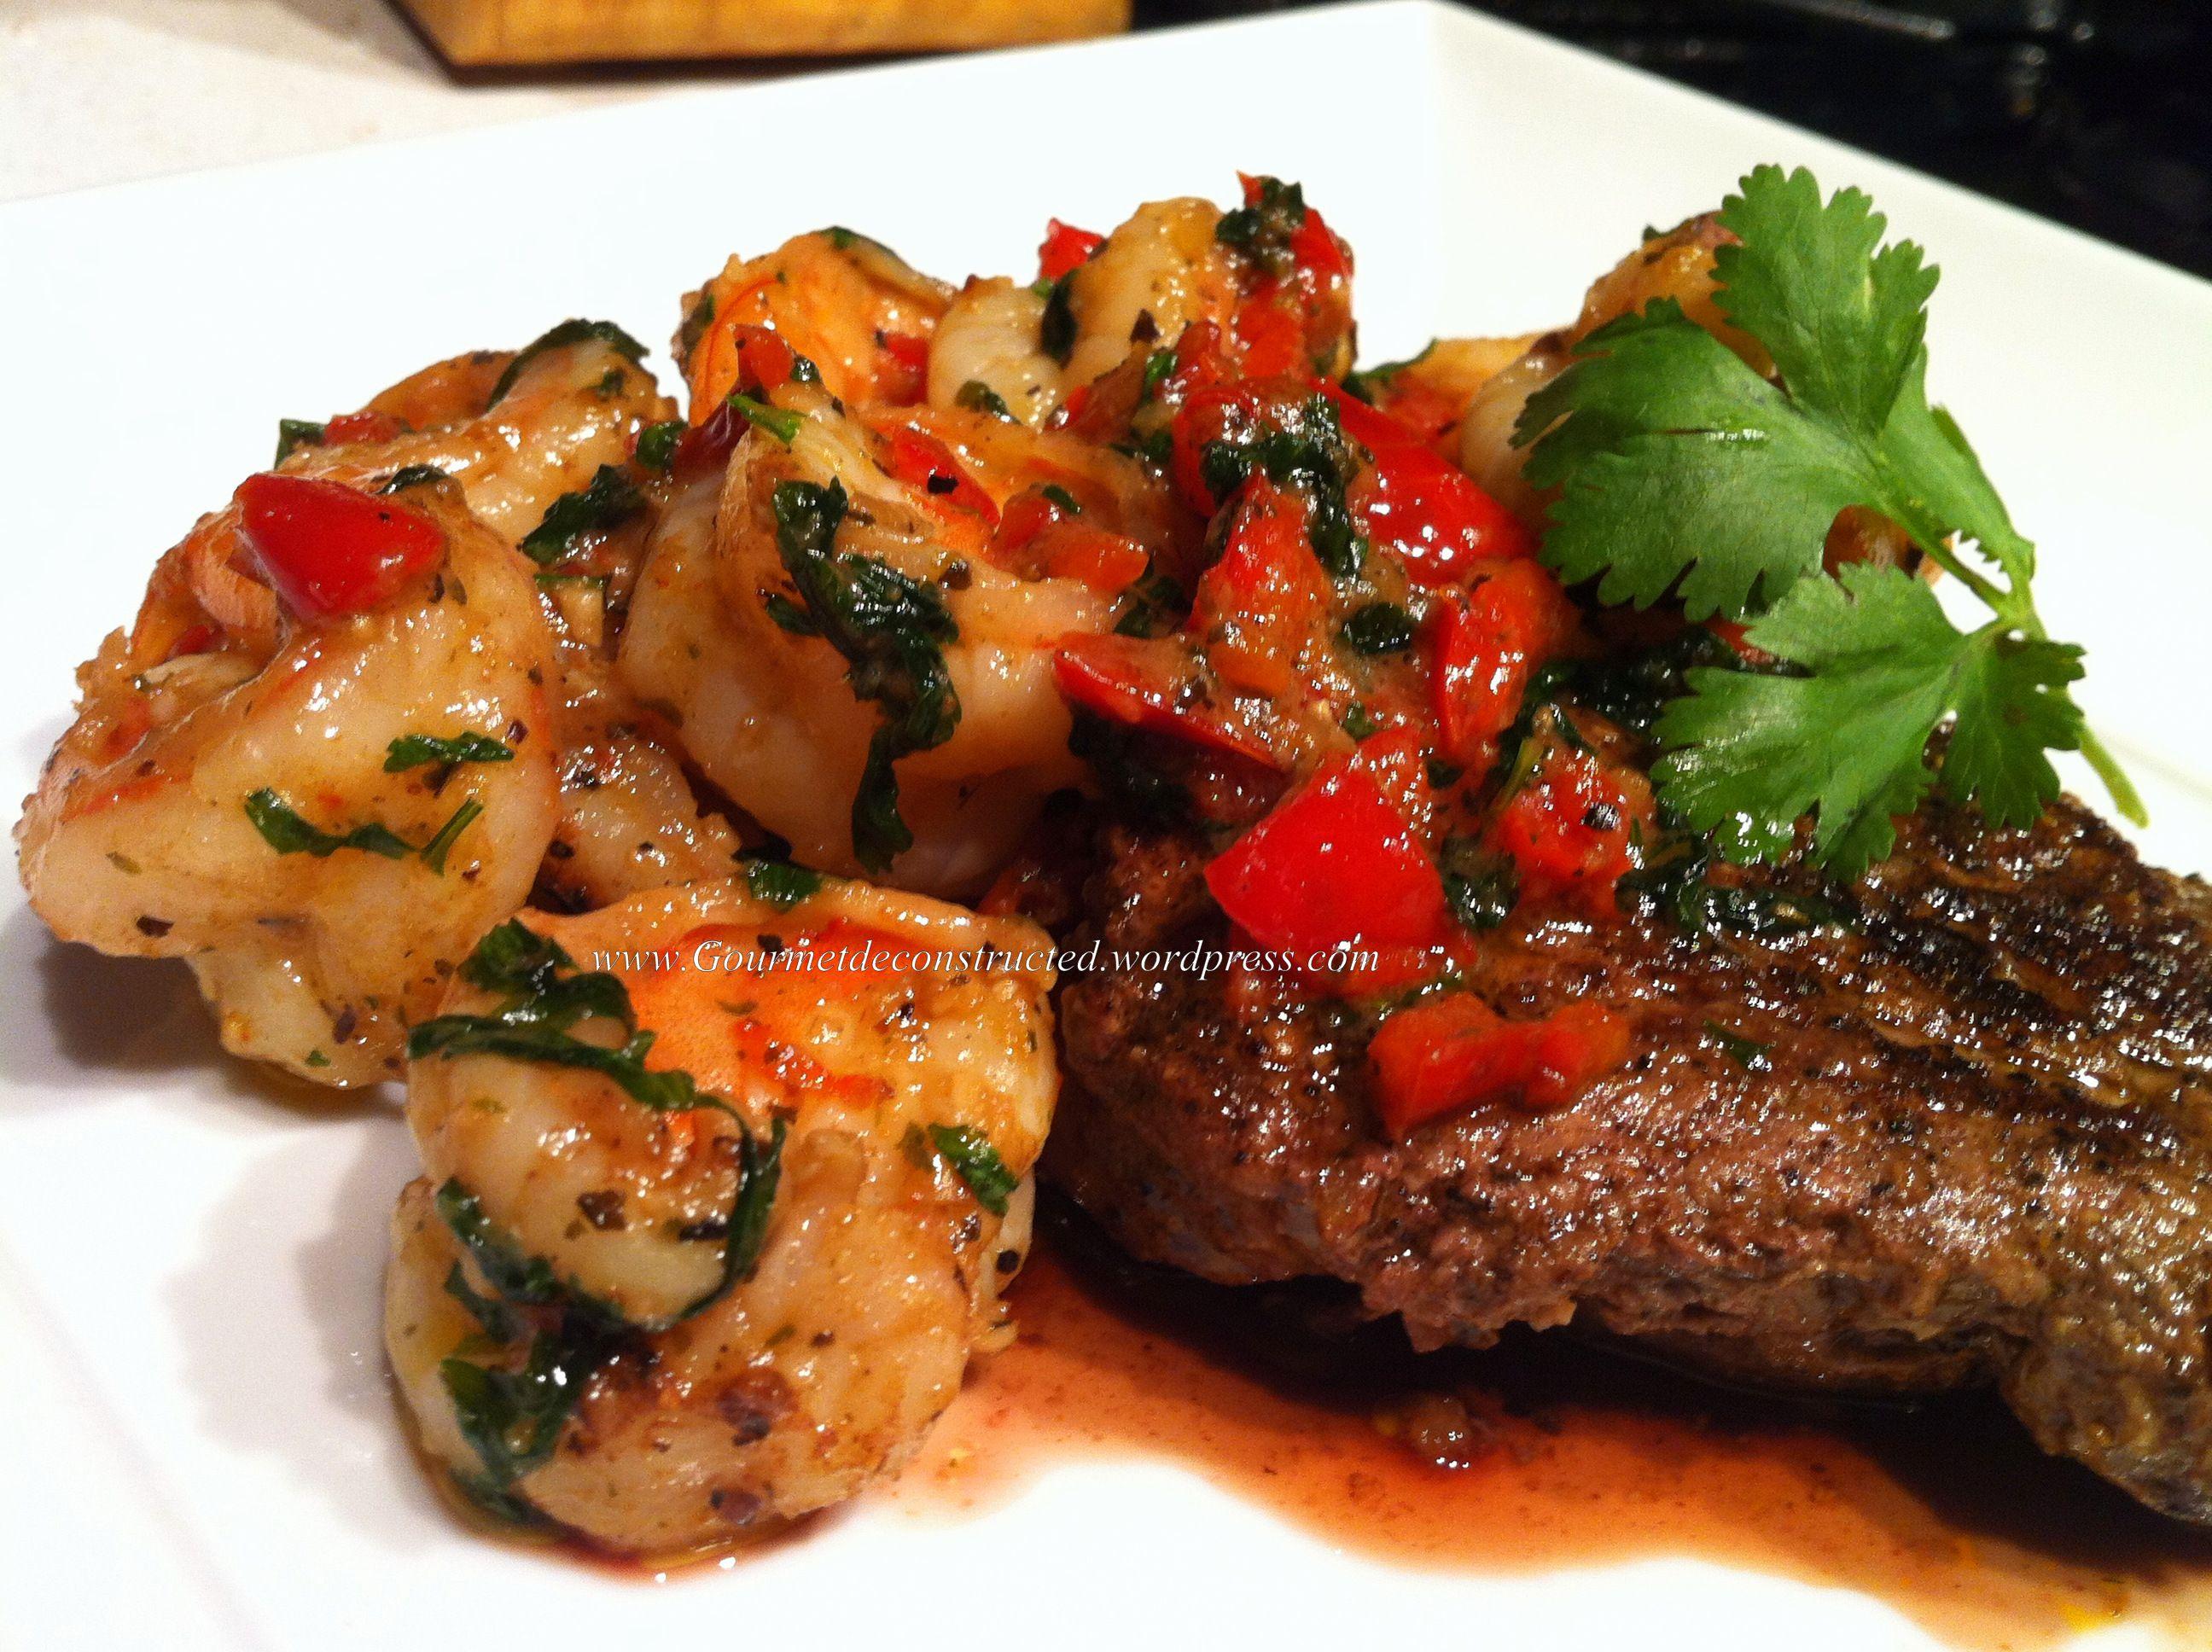 Cookbook menu gourmet and yummy food for Gourmet dinner menu ideas